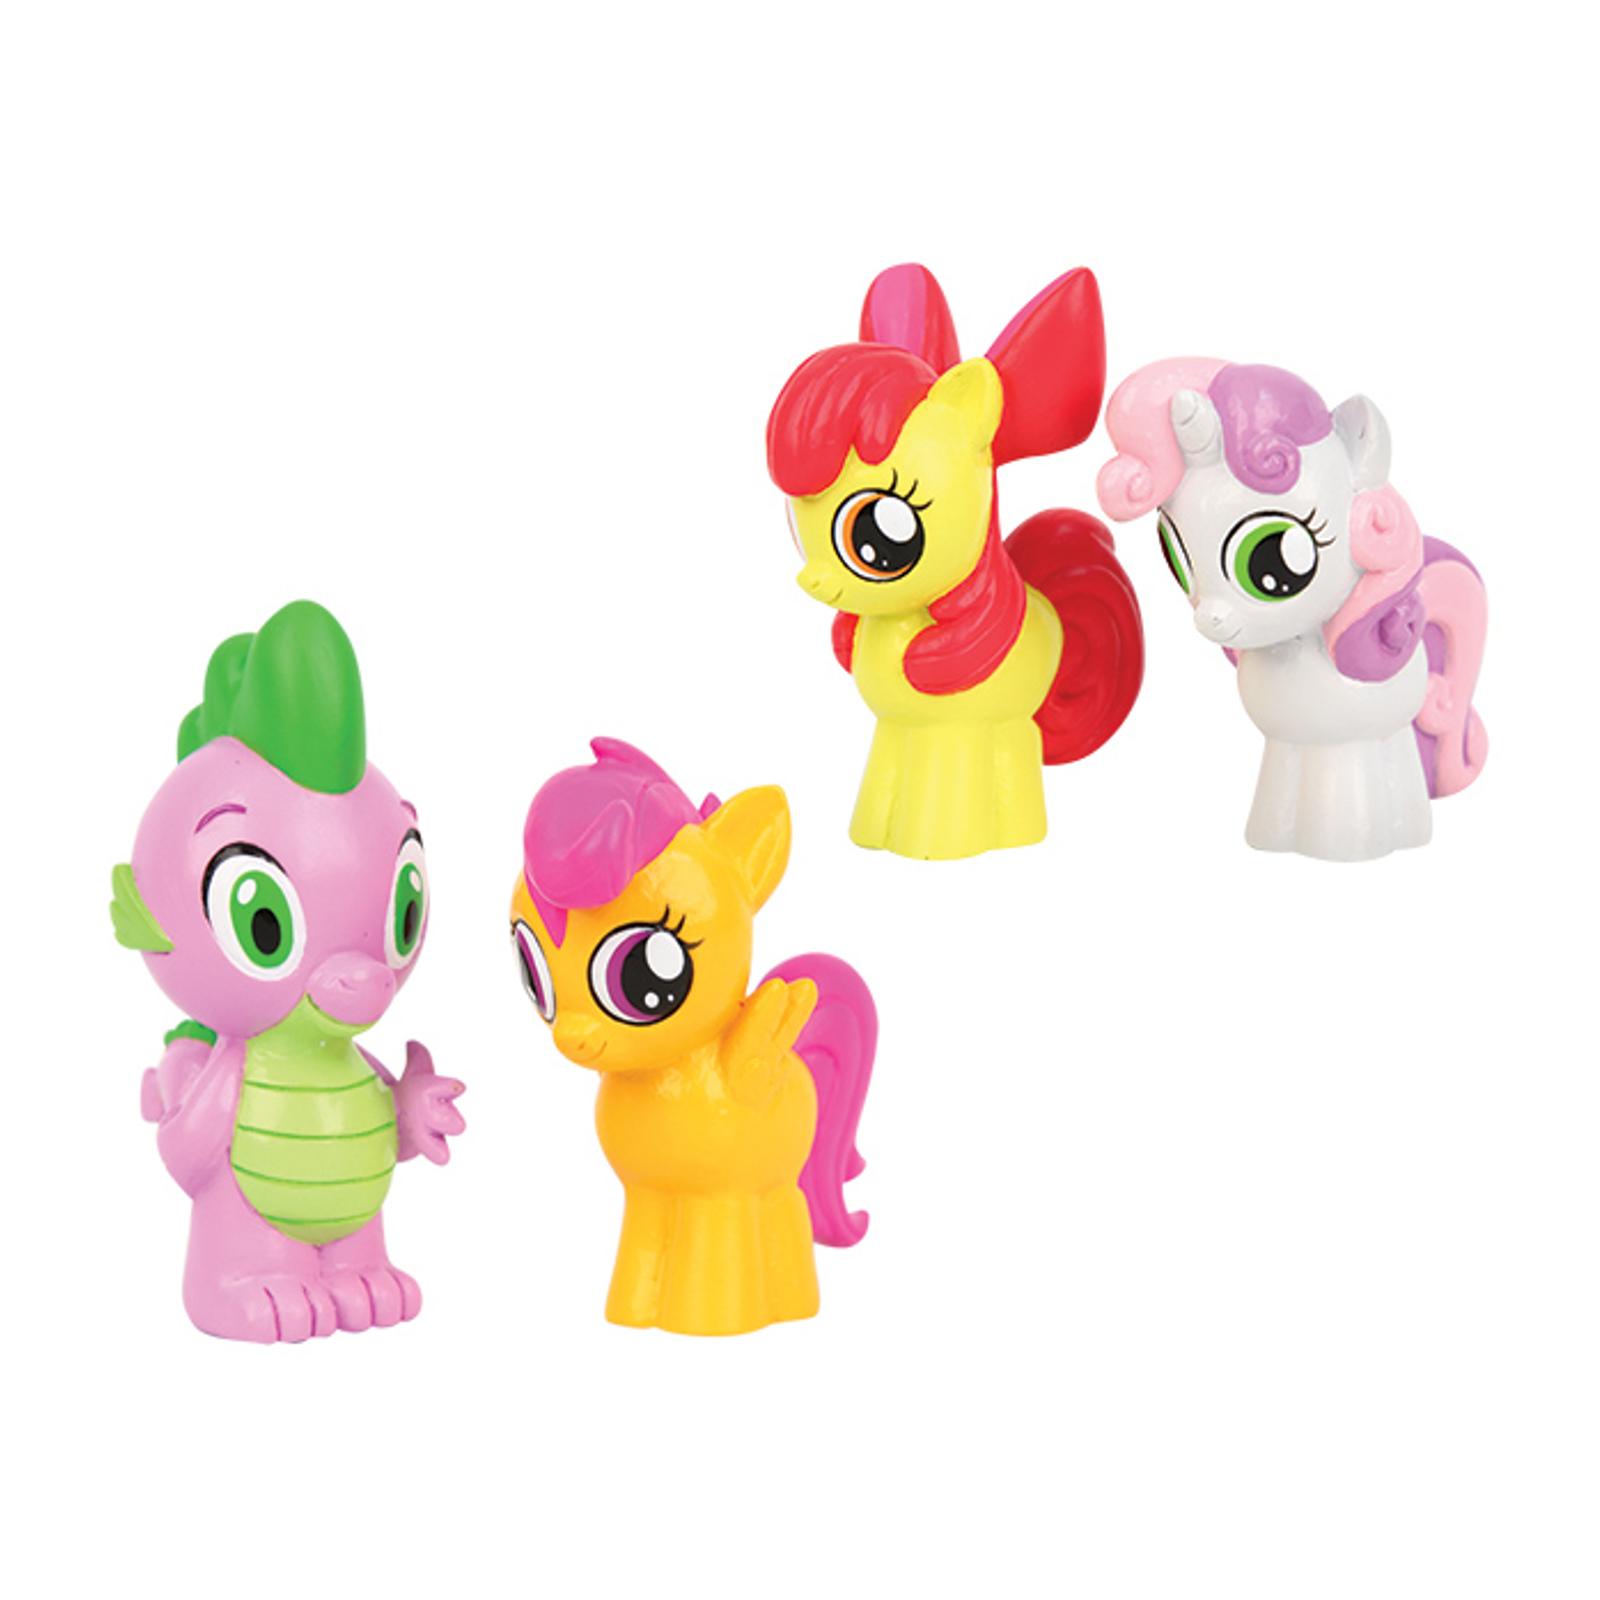 Фигурка My Little Pony Друзья Пони 2 шт. (в сетке)